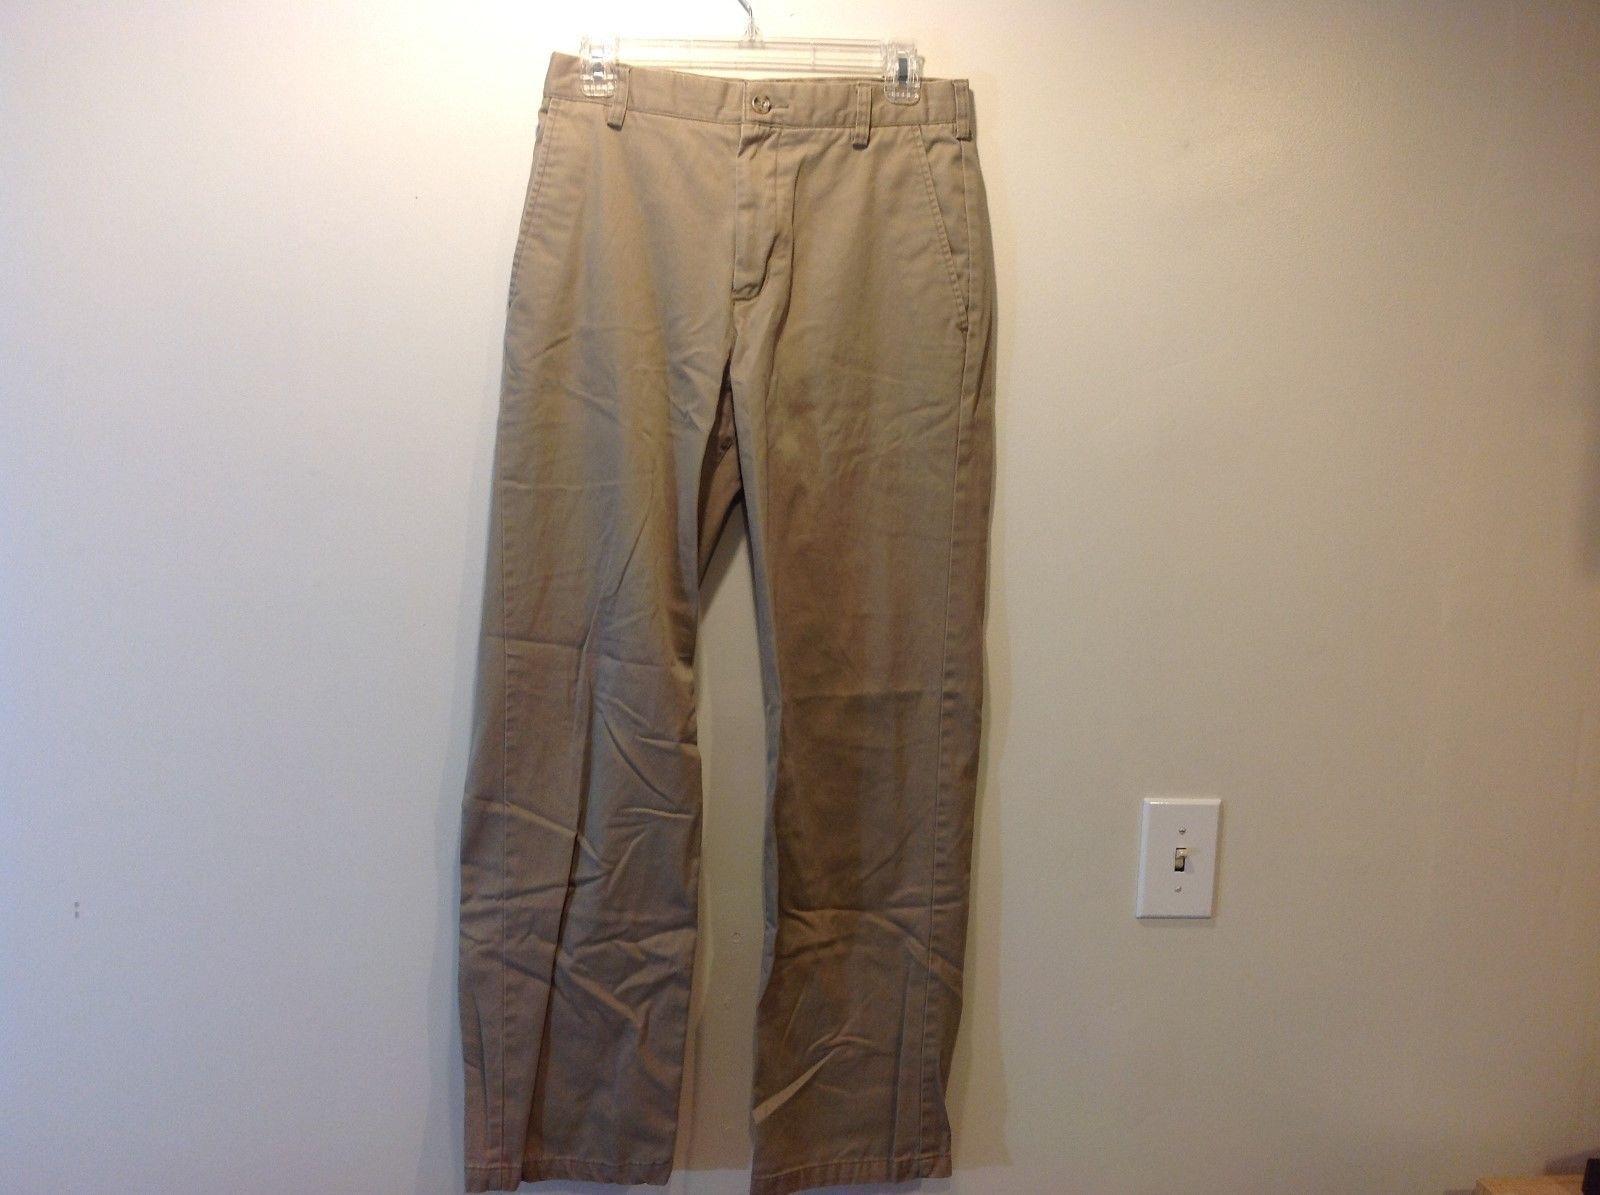 MERONA Classic Fit Men's Khaki Colored Pants Sz 30/32